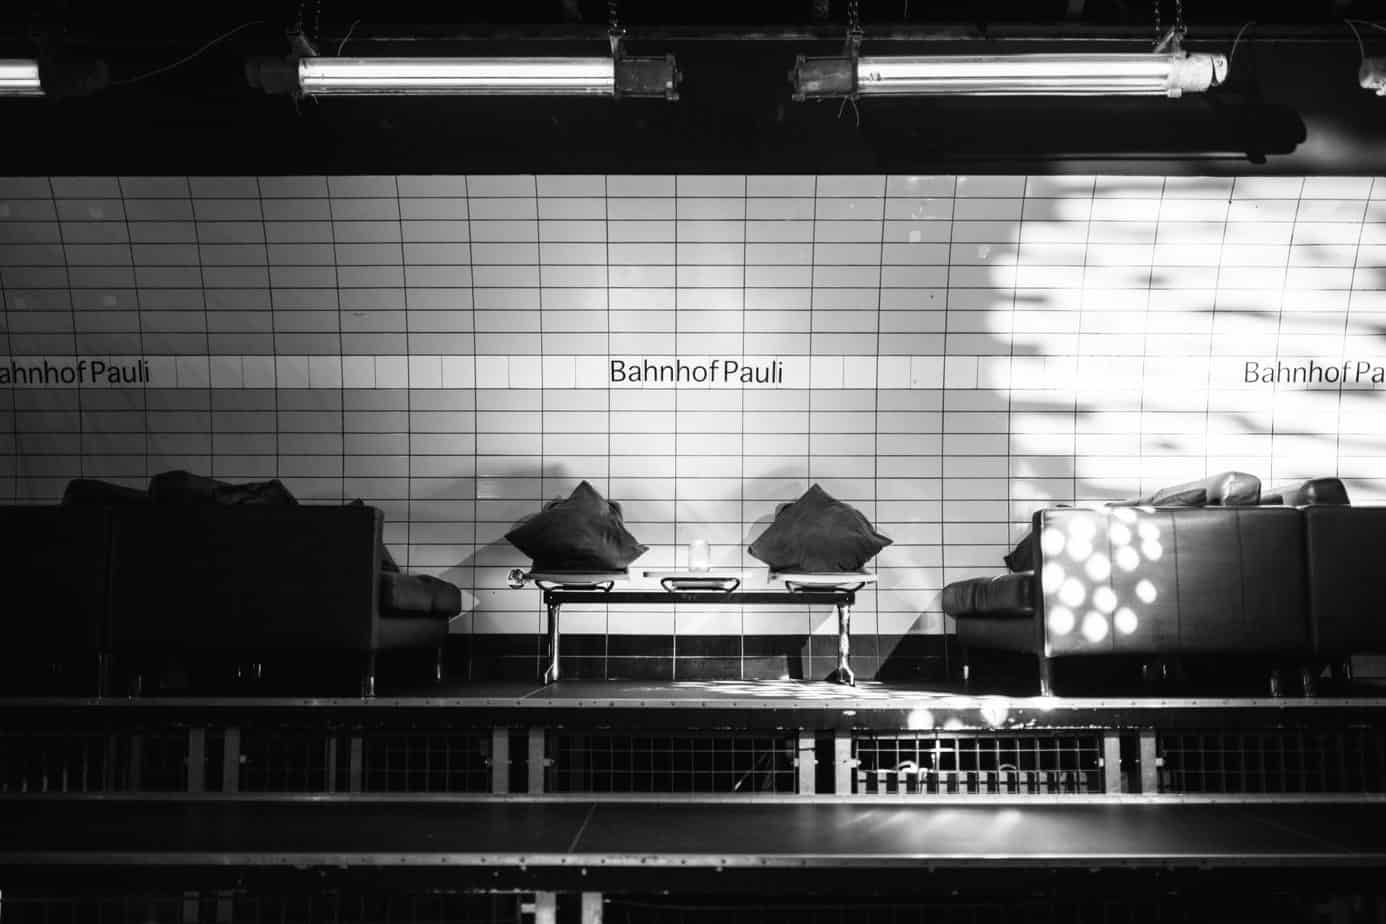 Bahnhof Pauli im Klubhaus Foto: chvbbls